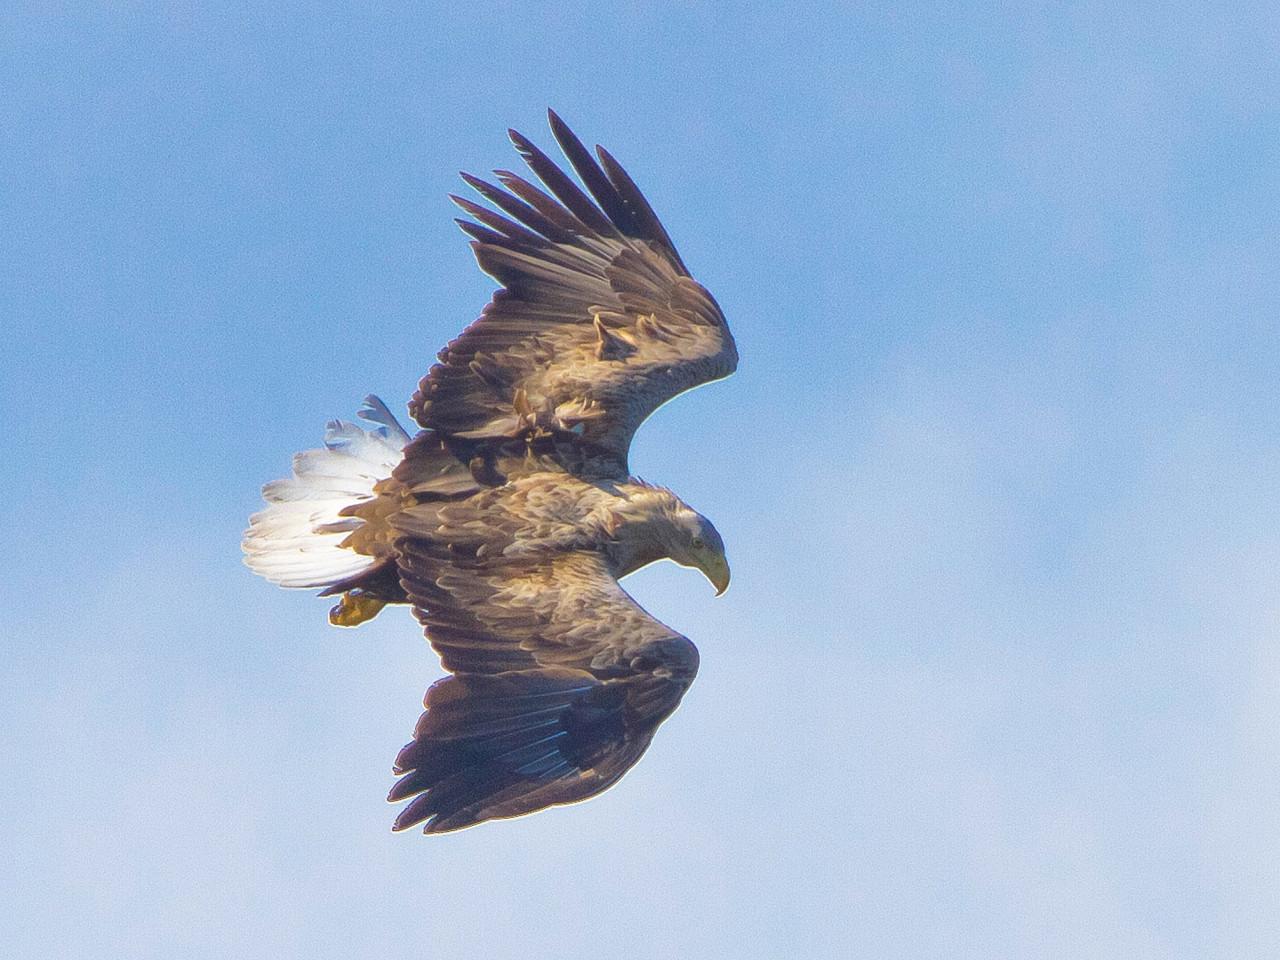 Fliegender Seeadler